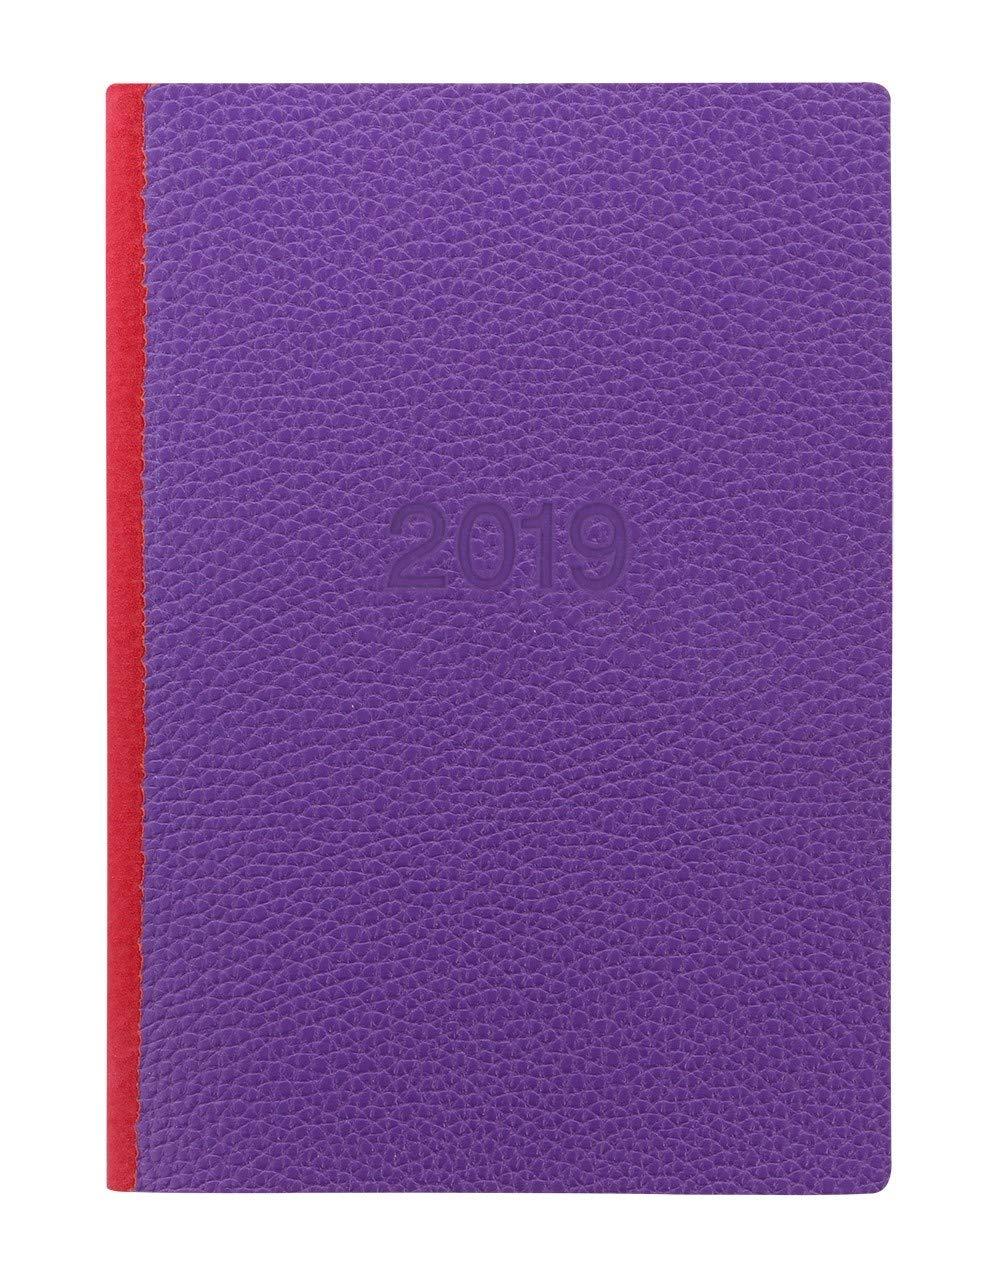 Letts Two Tone Agenda scolaire journalier A5 2019 Purple Red 1 semaine sur 2 pages Filofax